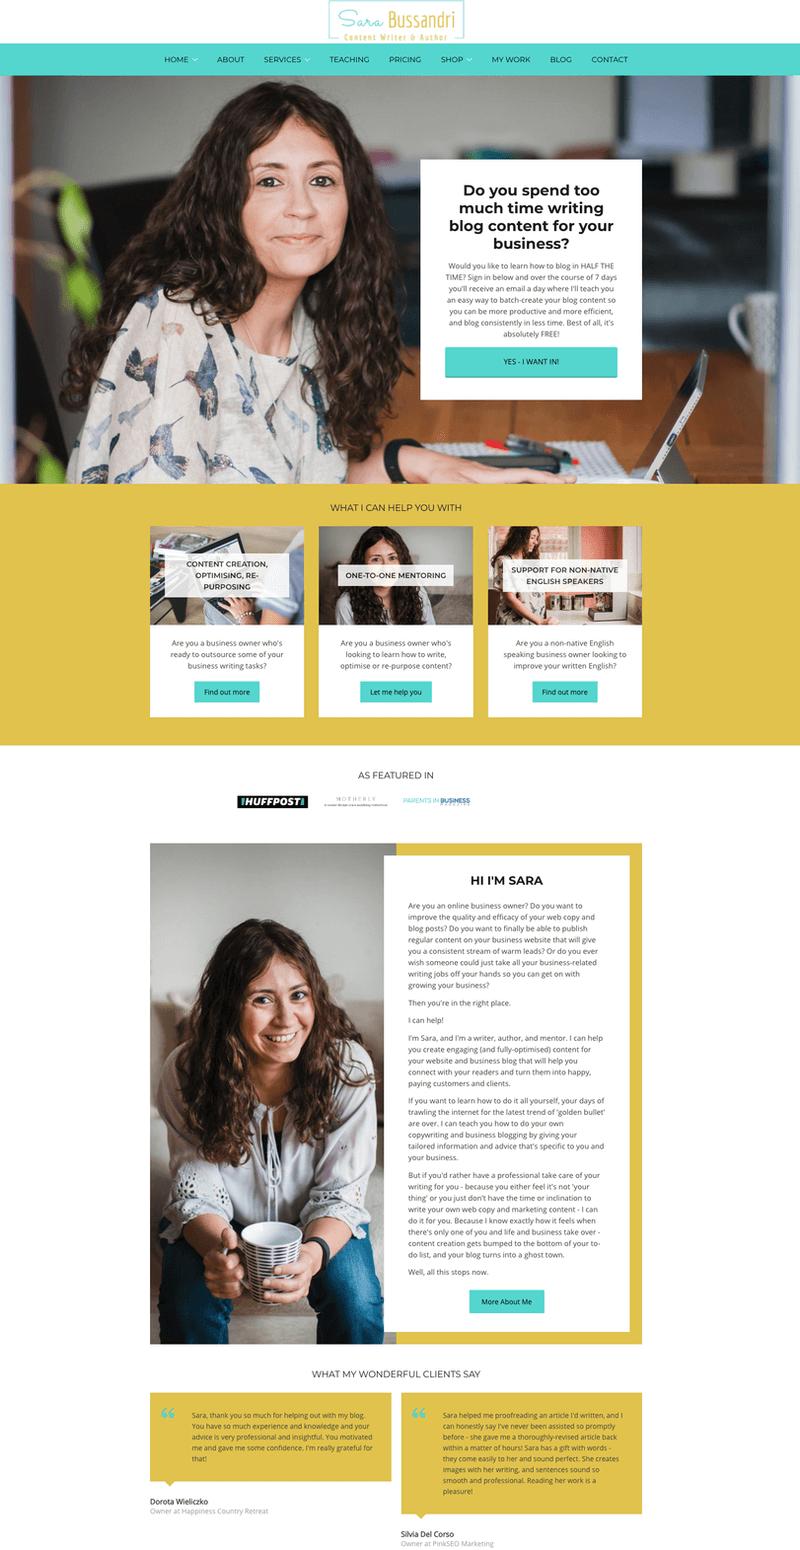 Sara Bussandri website